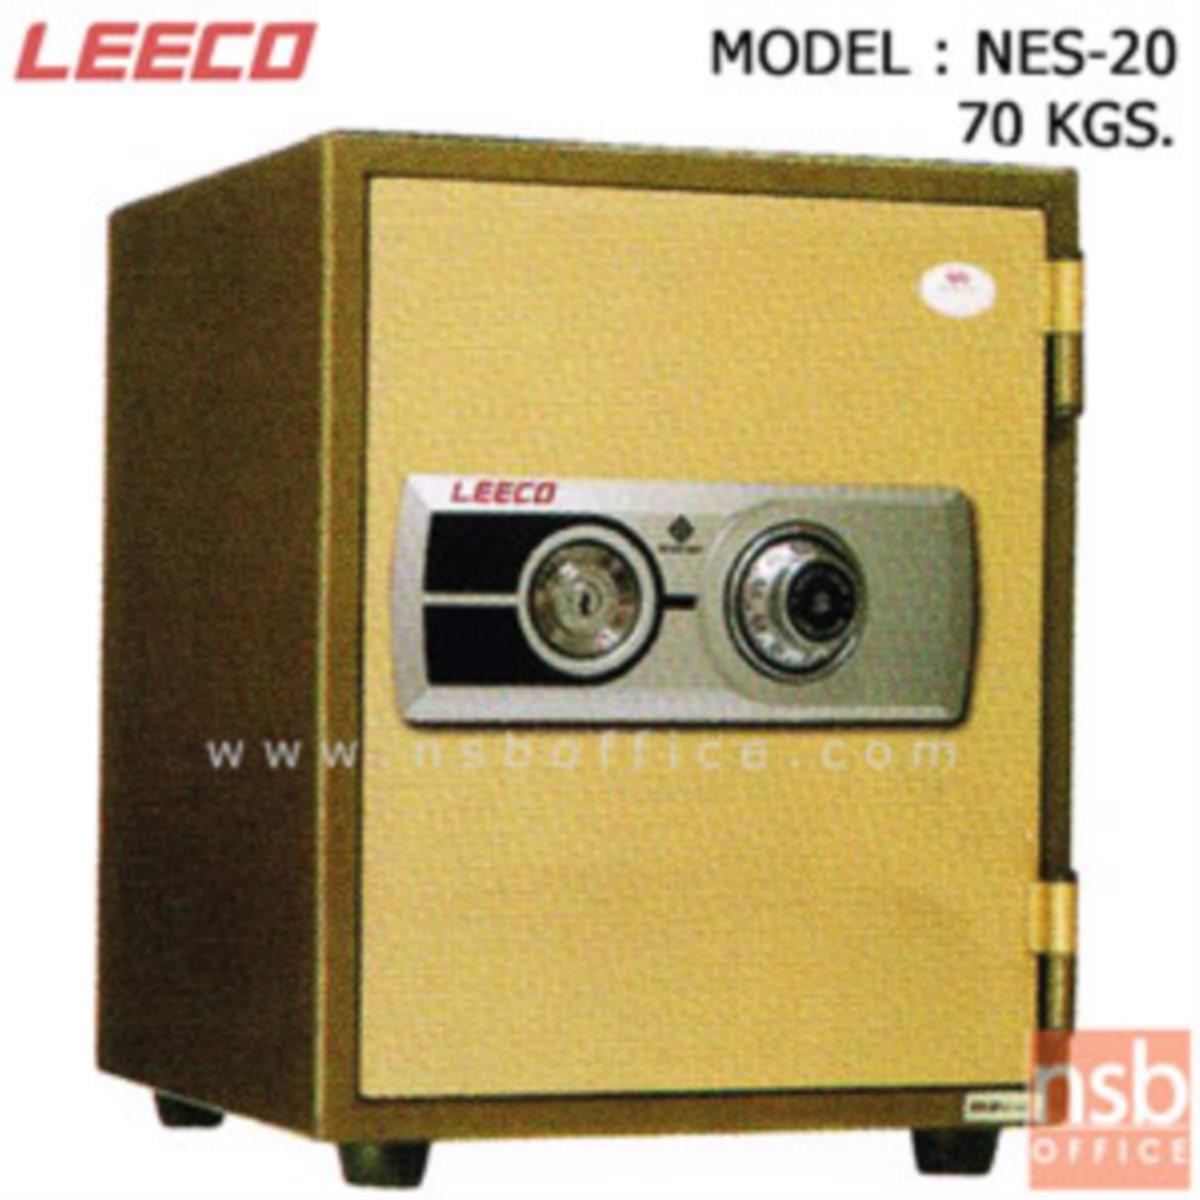 F02A046:ตู้เซฟนิรภัย 70 กก.(แนวตั้ง) ลีโก้ รุ่น NES-20 มี 1 กุญแจ 1 รหัส